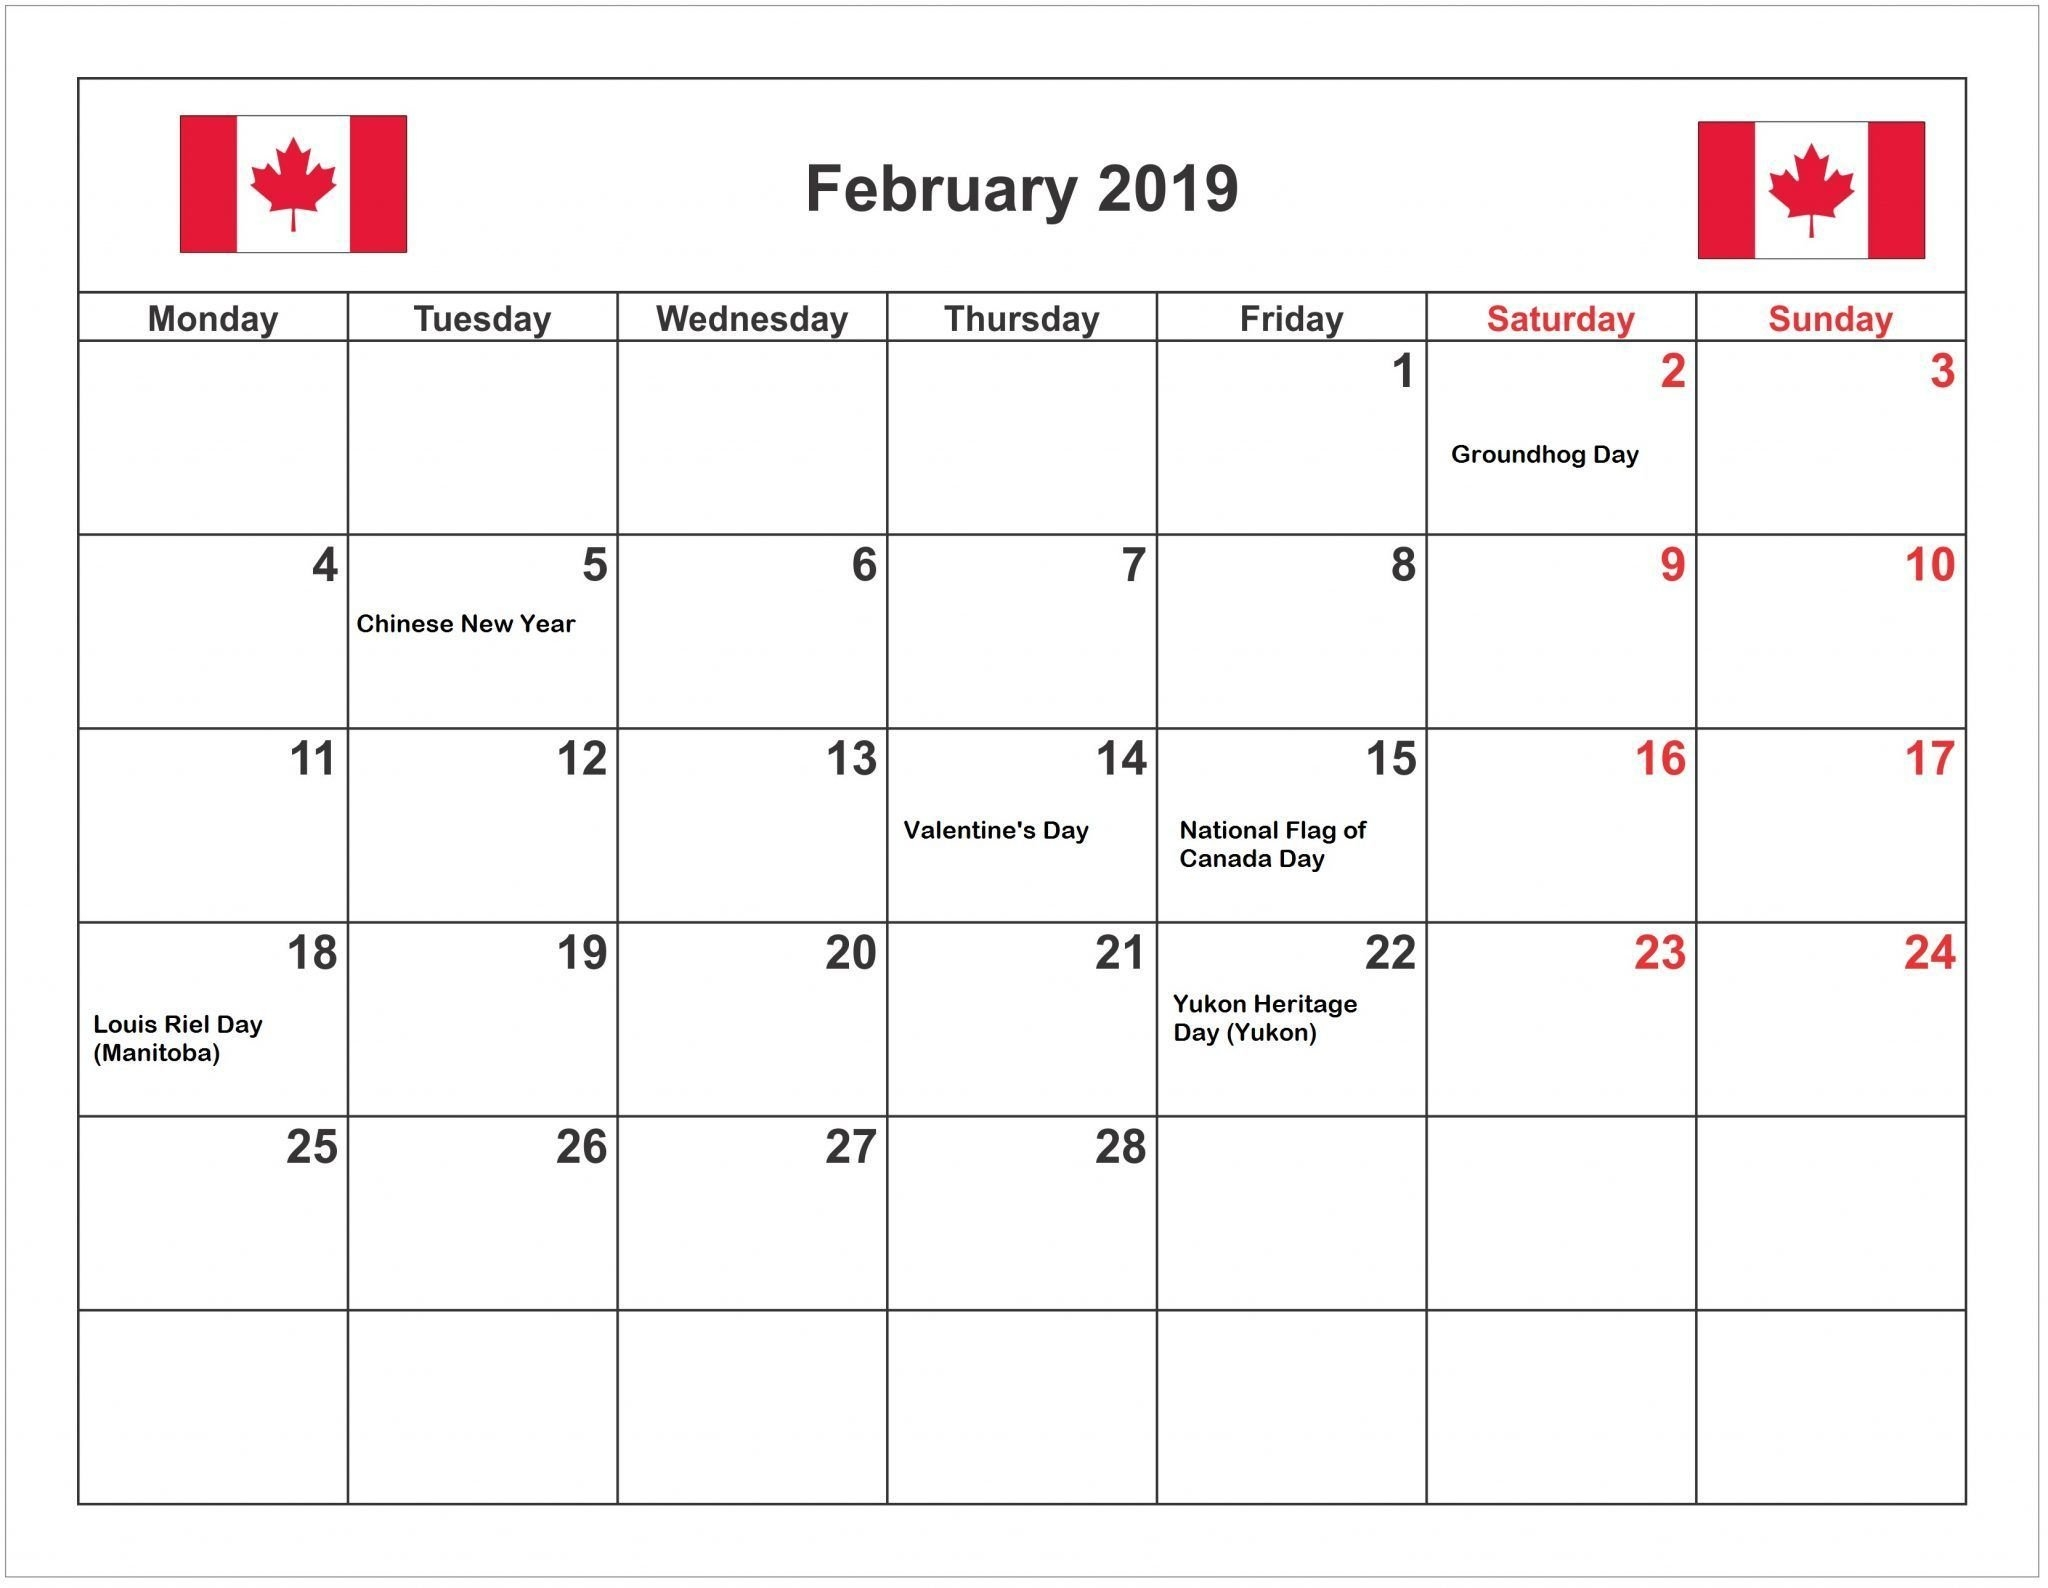 February 2019 Calendar Canada With Holidays   February 2019 Calendar Calendar 2019 Canada Holidays